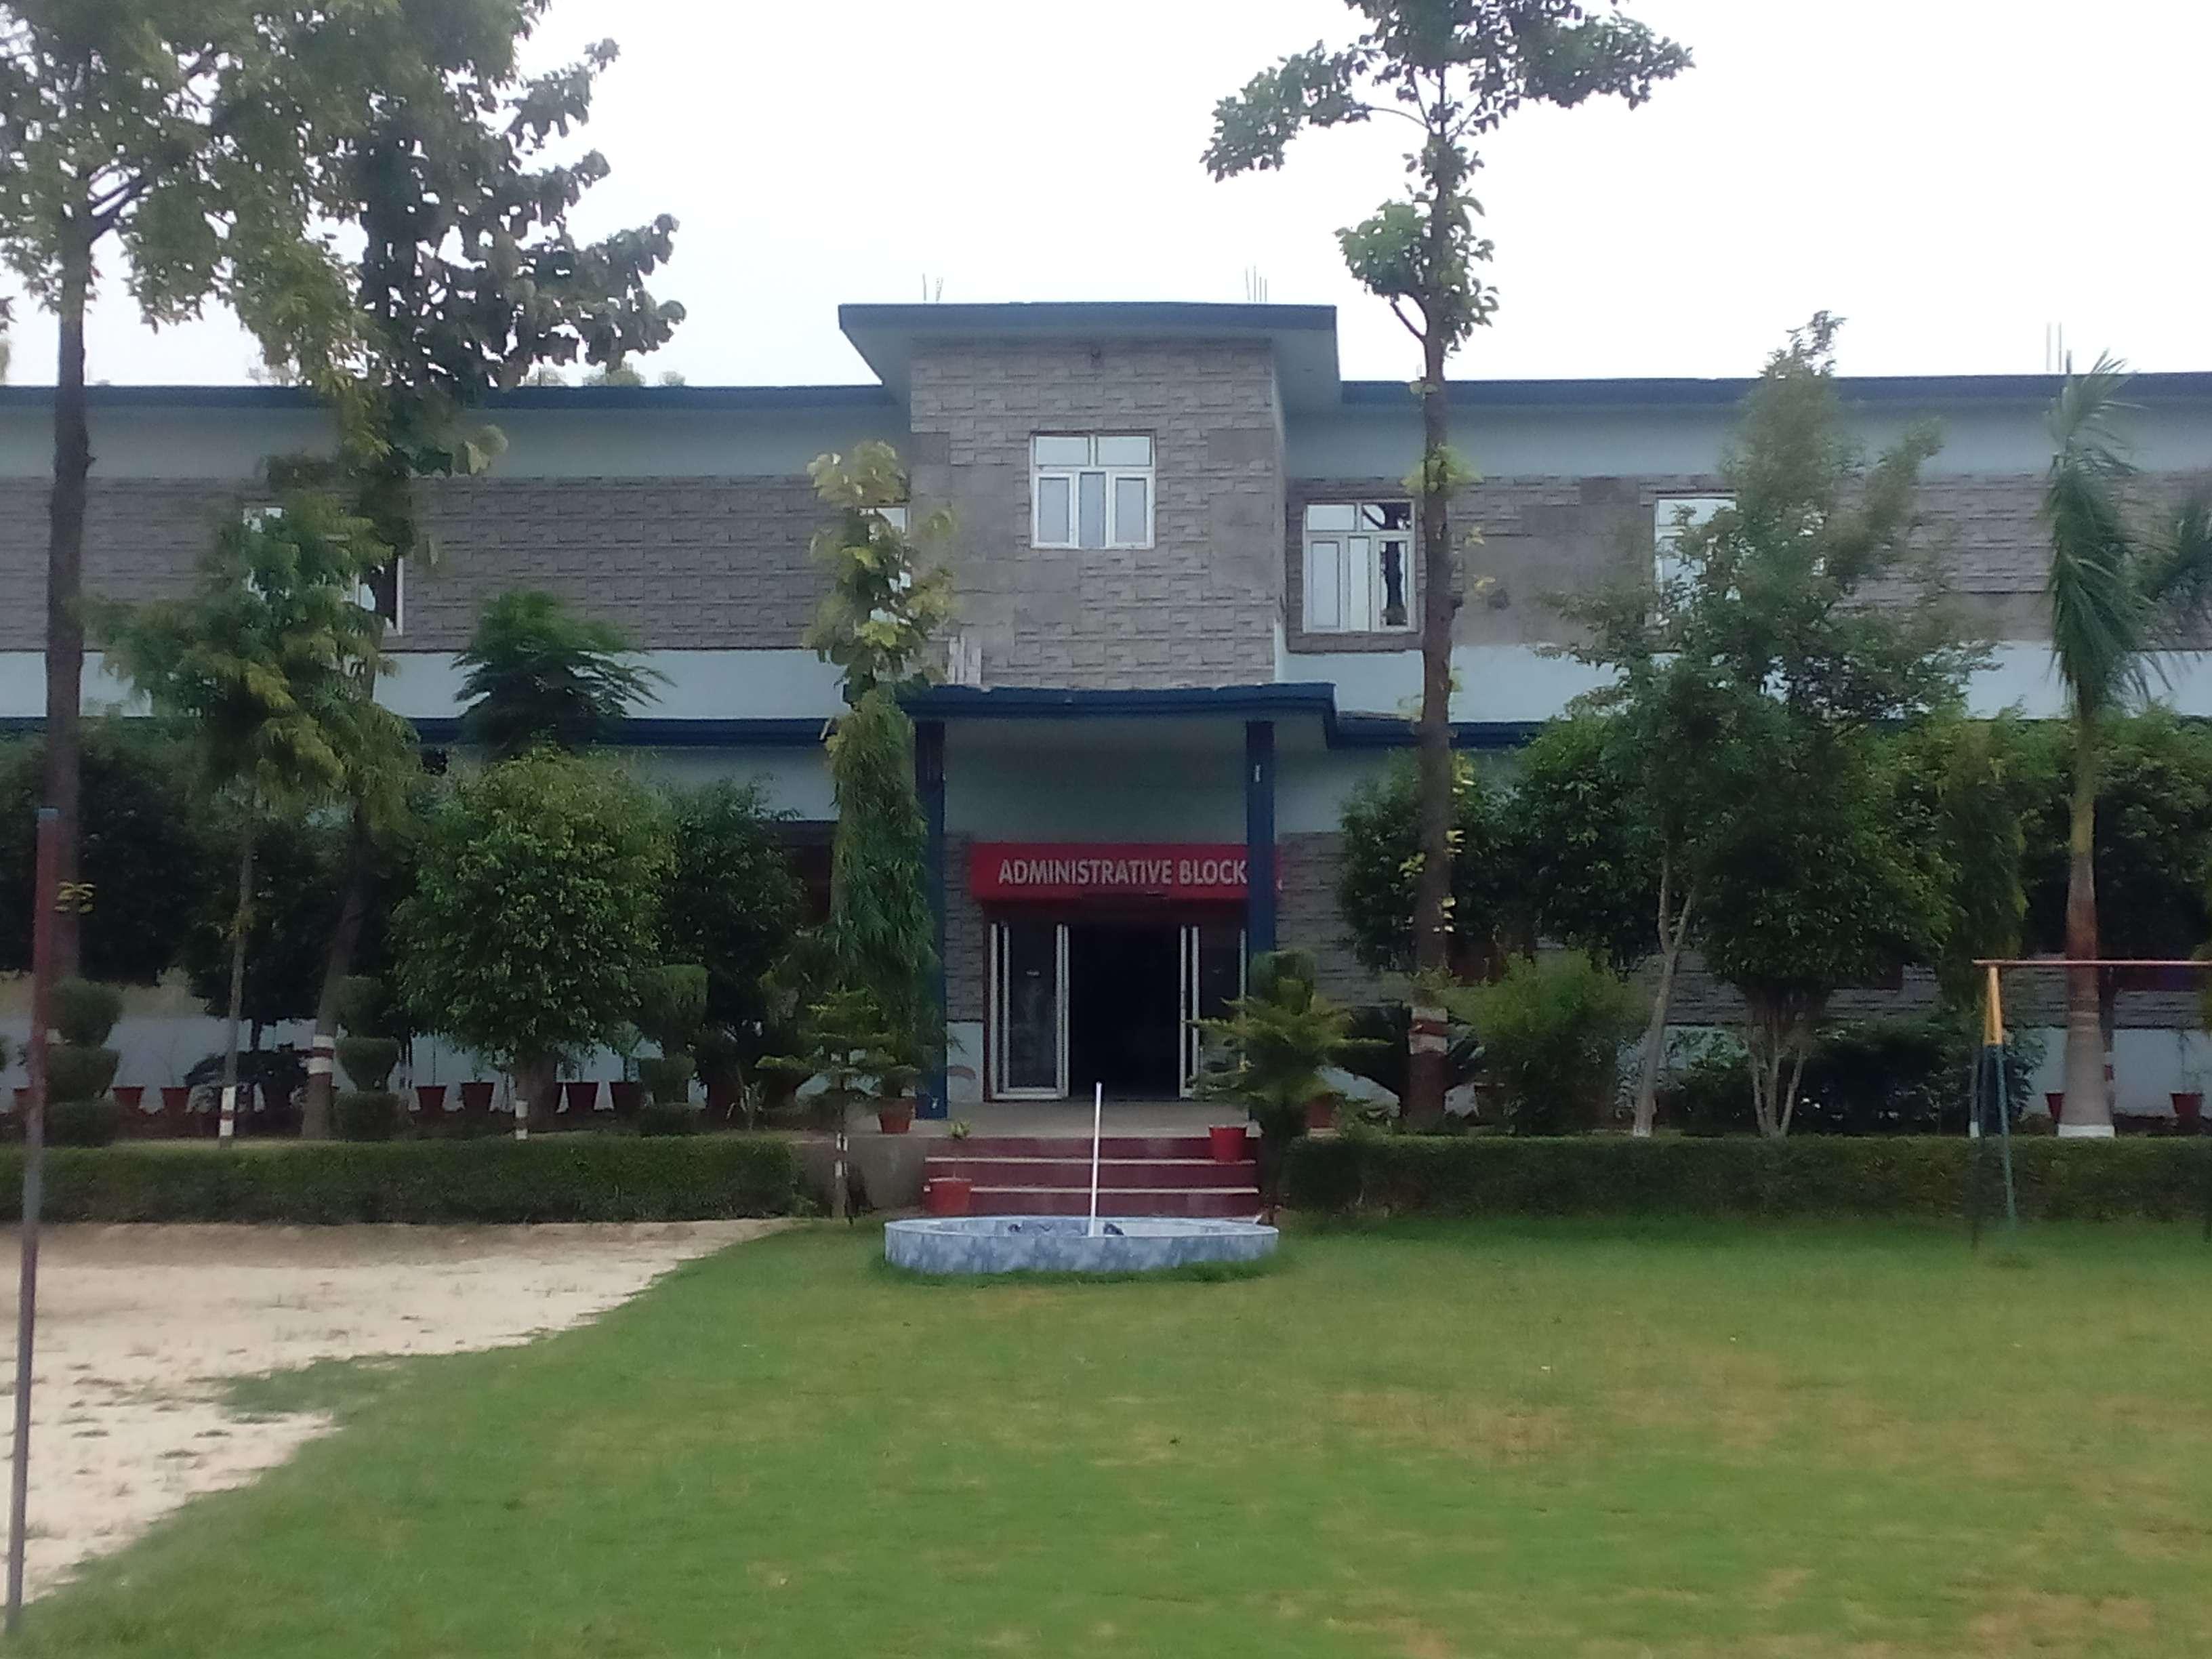 AWAGARH PUBLIC SCHOOL Awagarh Public School Jalesar Road Awagarh Etah U P 2131228